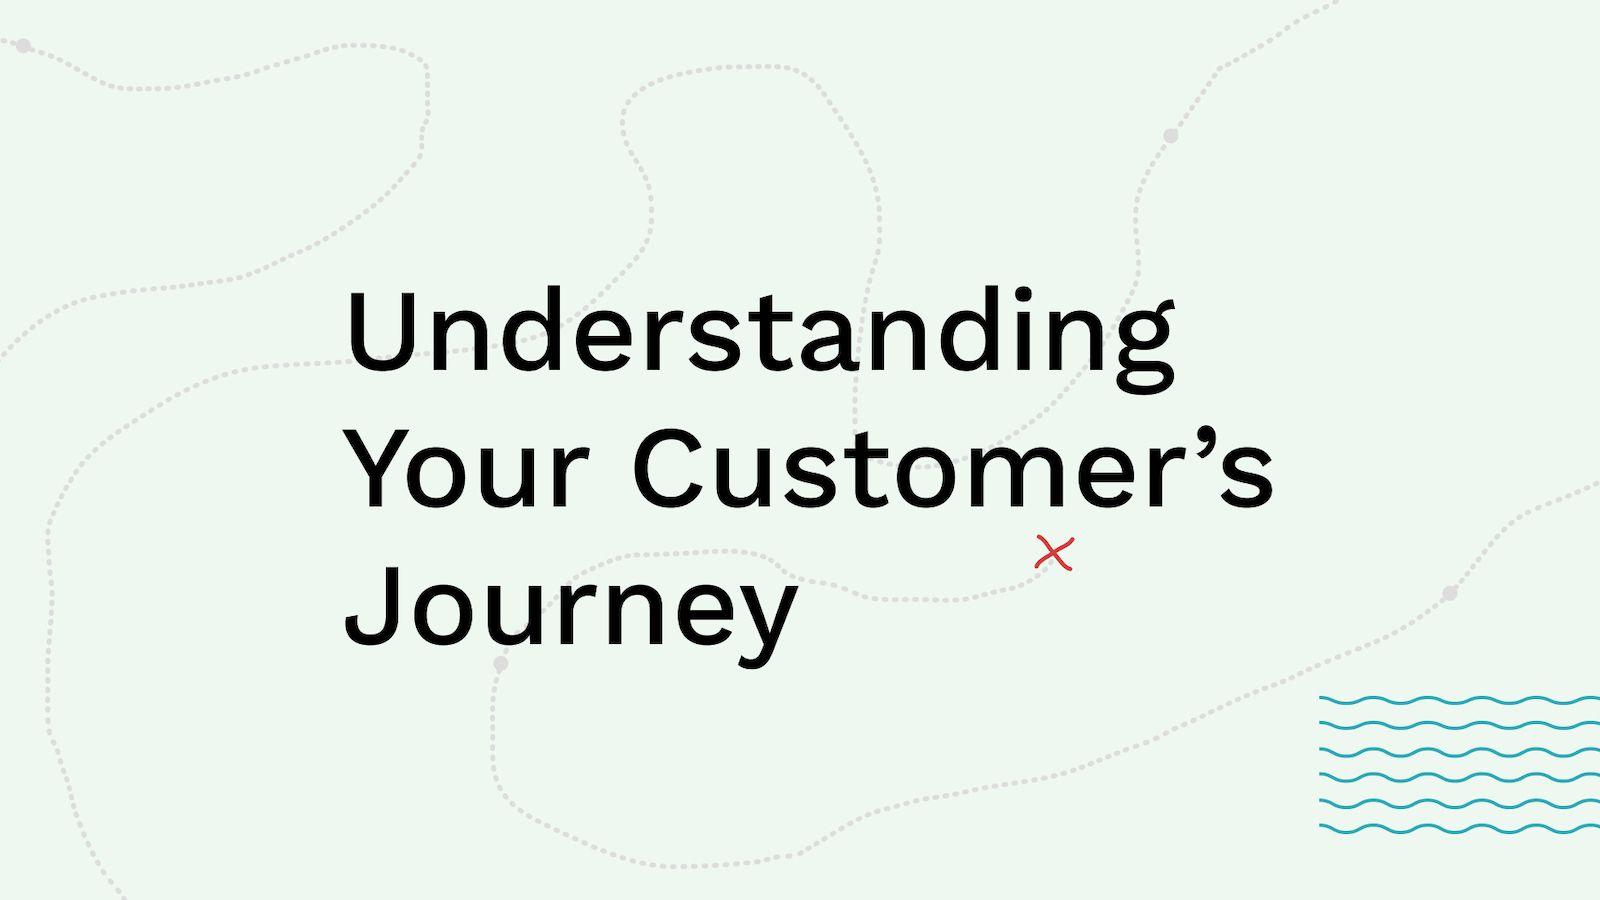 understanding your customer's journey promotional graphic